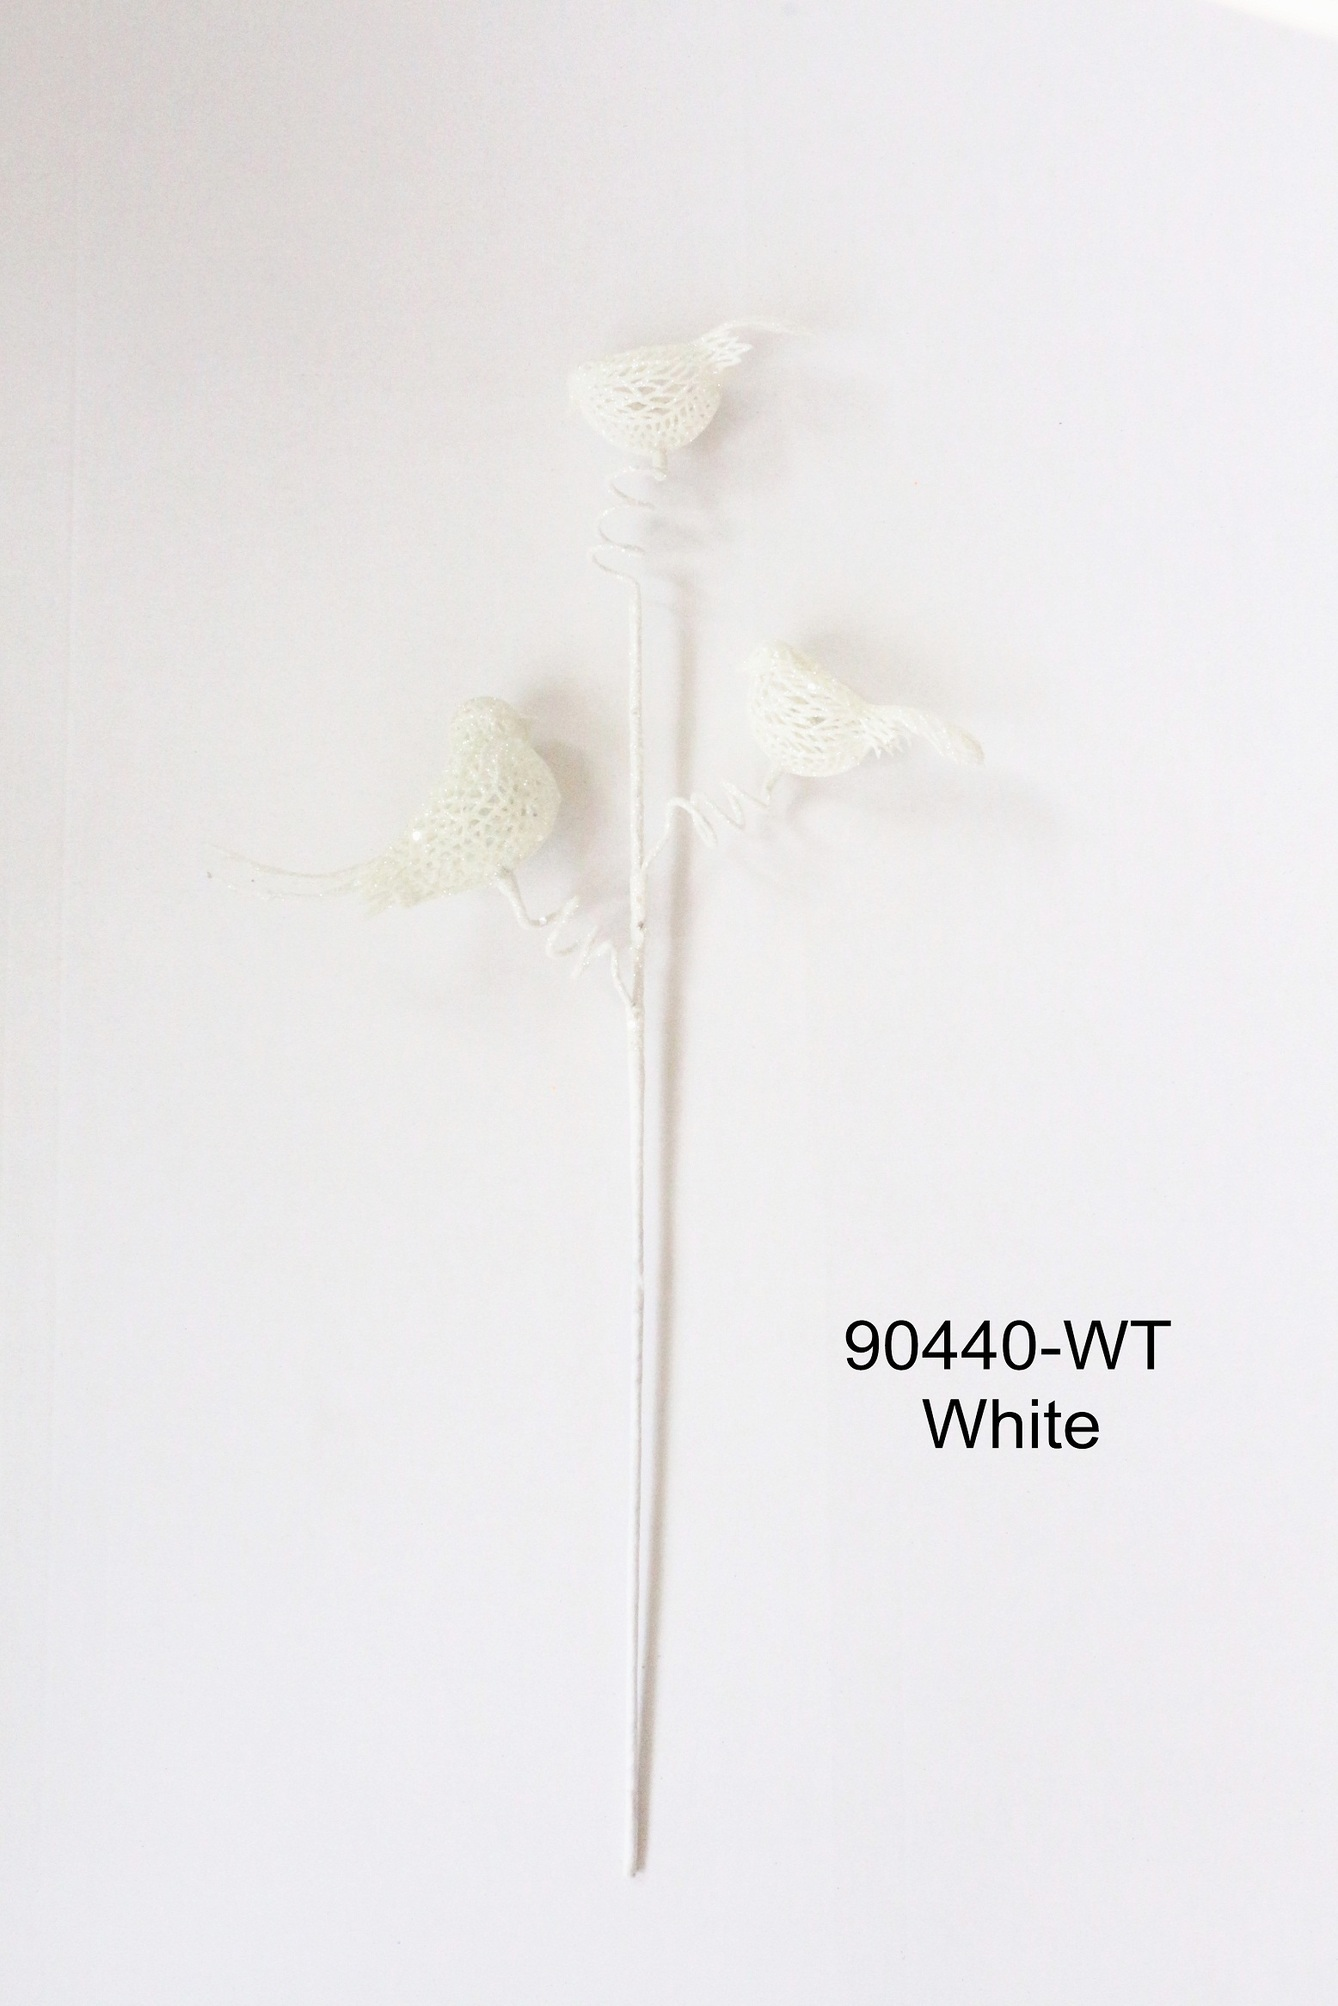 90440-WT